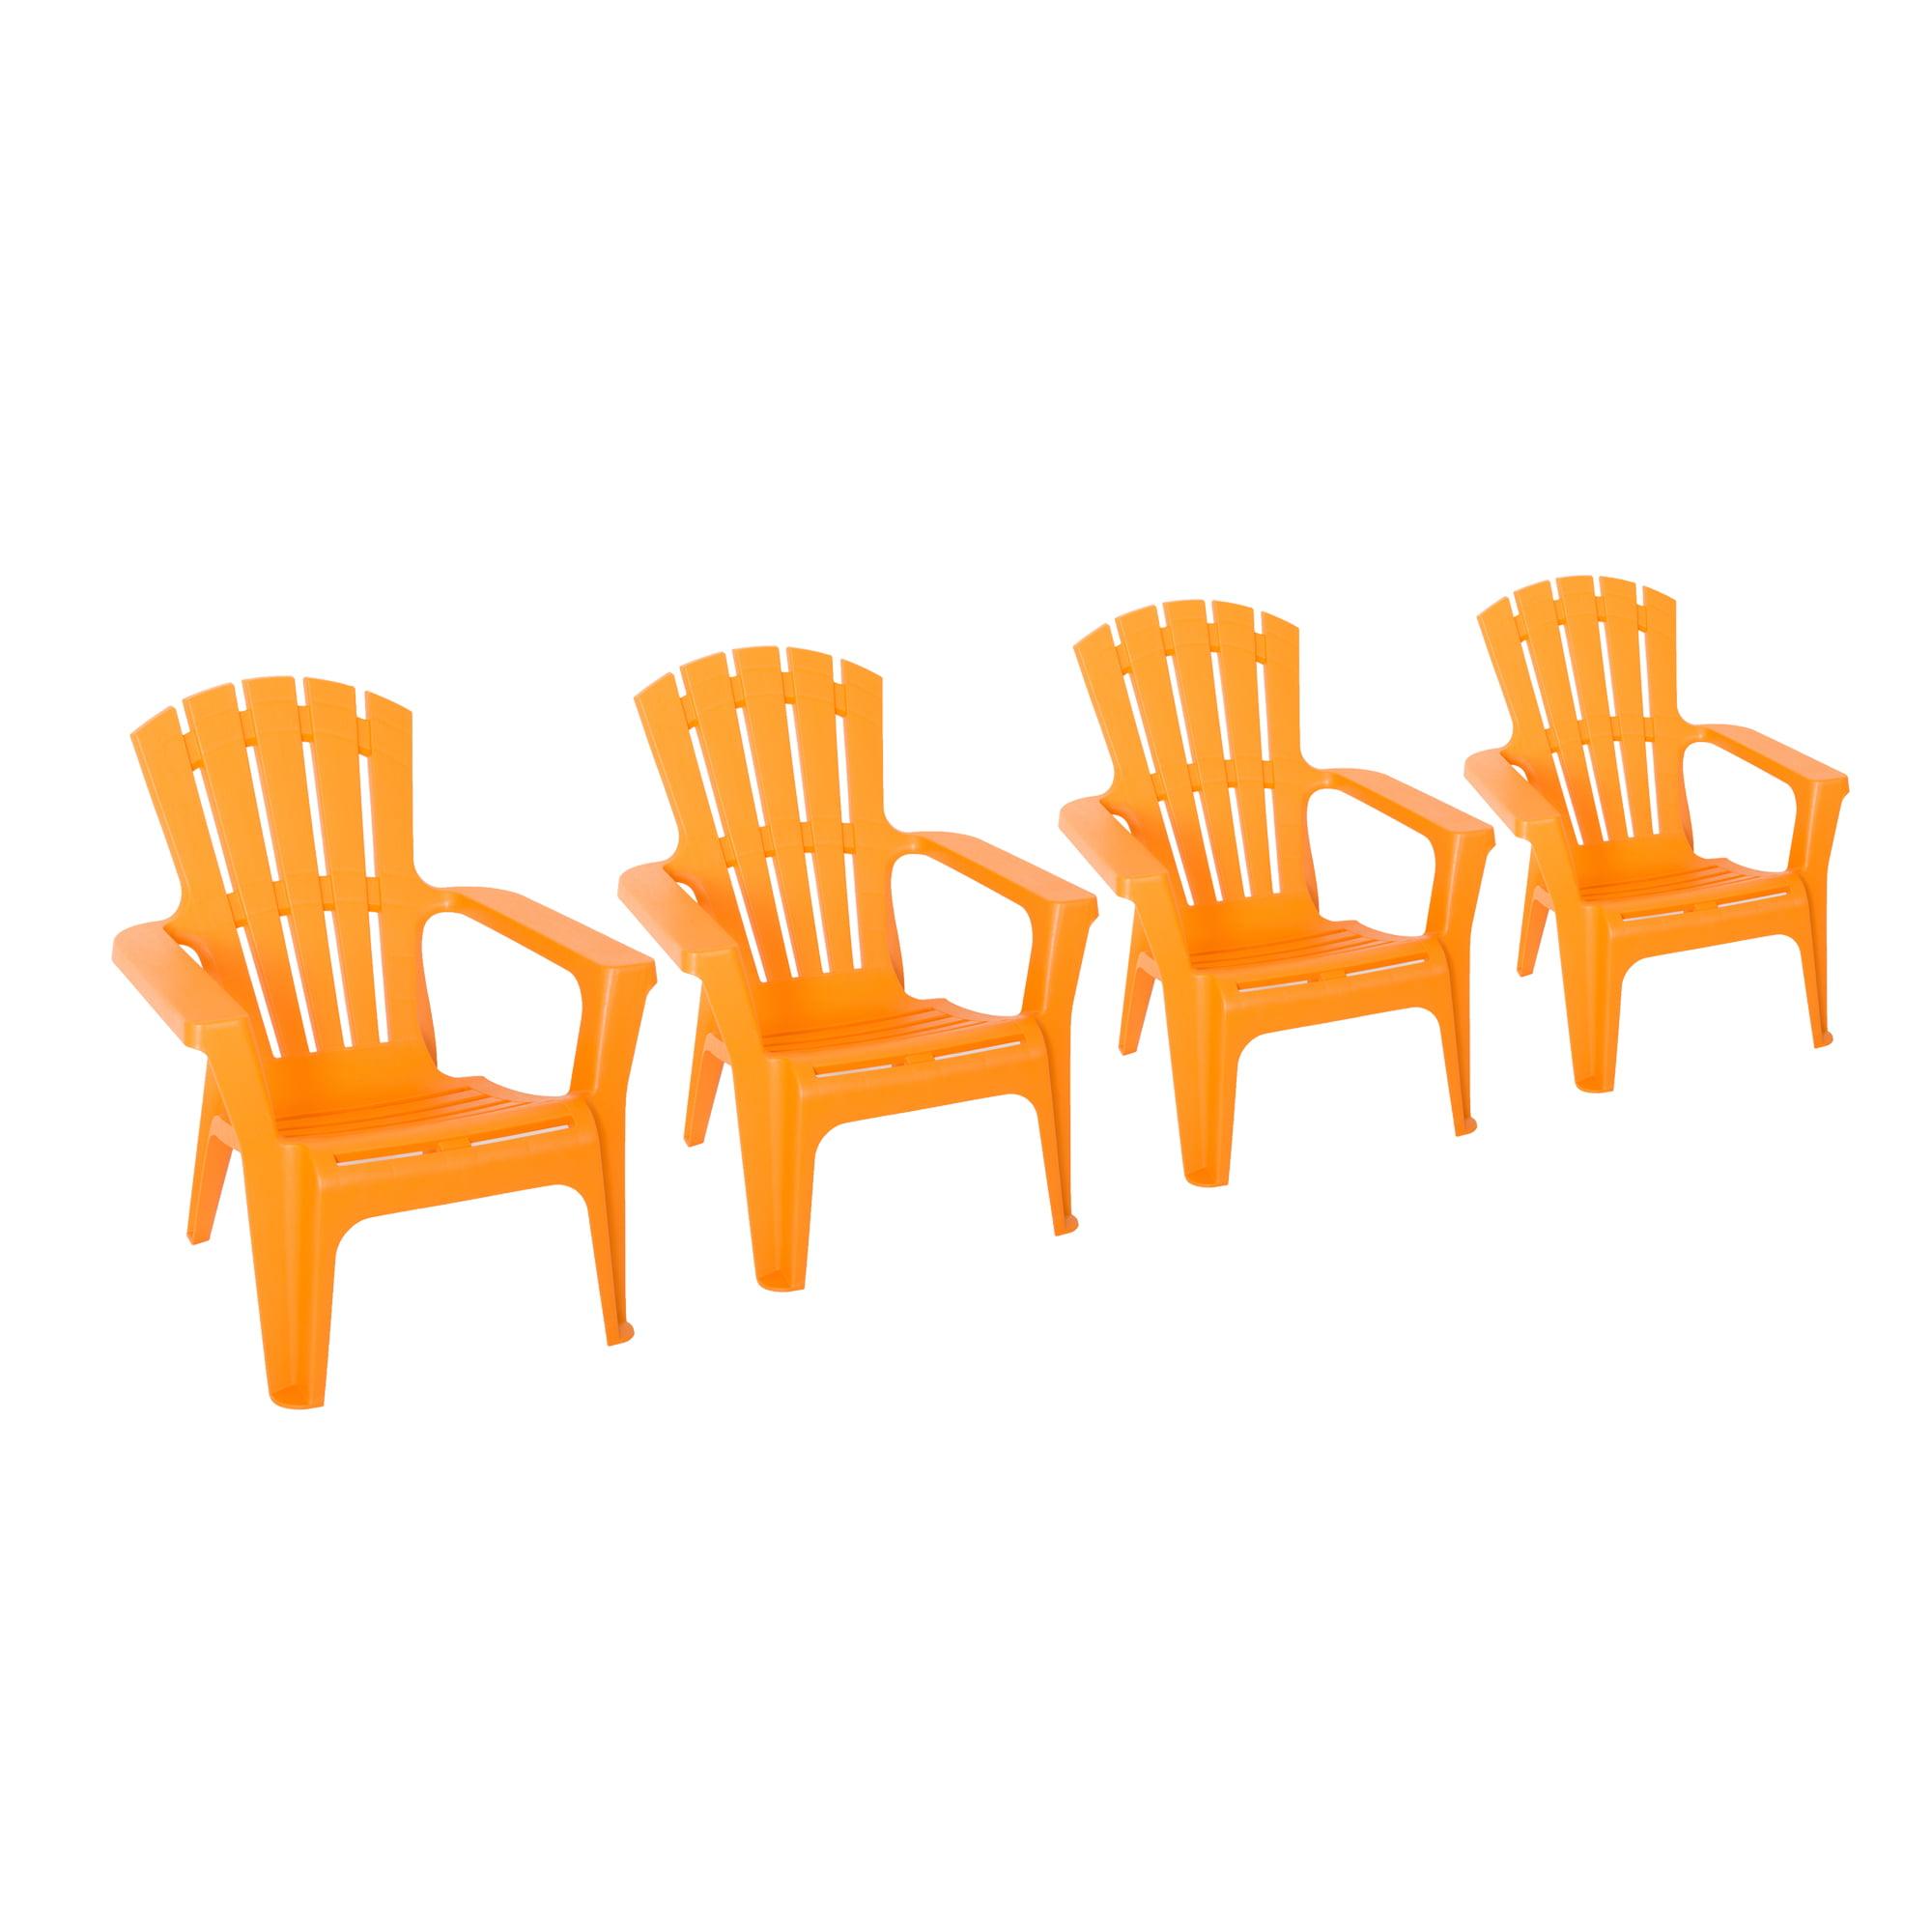 Incadozo Adirondack Chair in Orange (4 Pack)